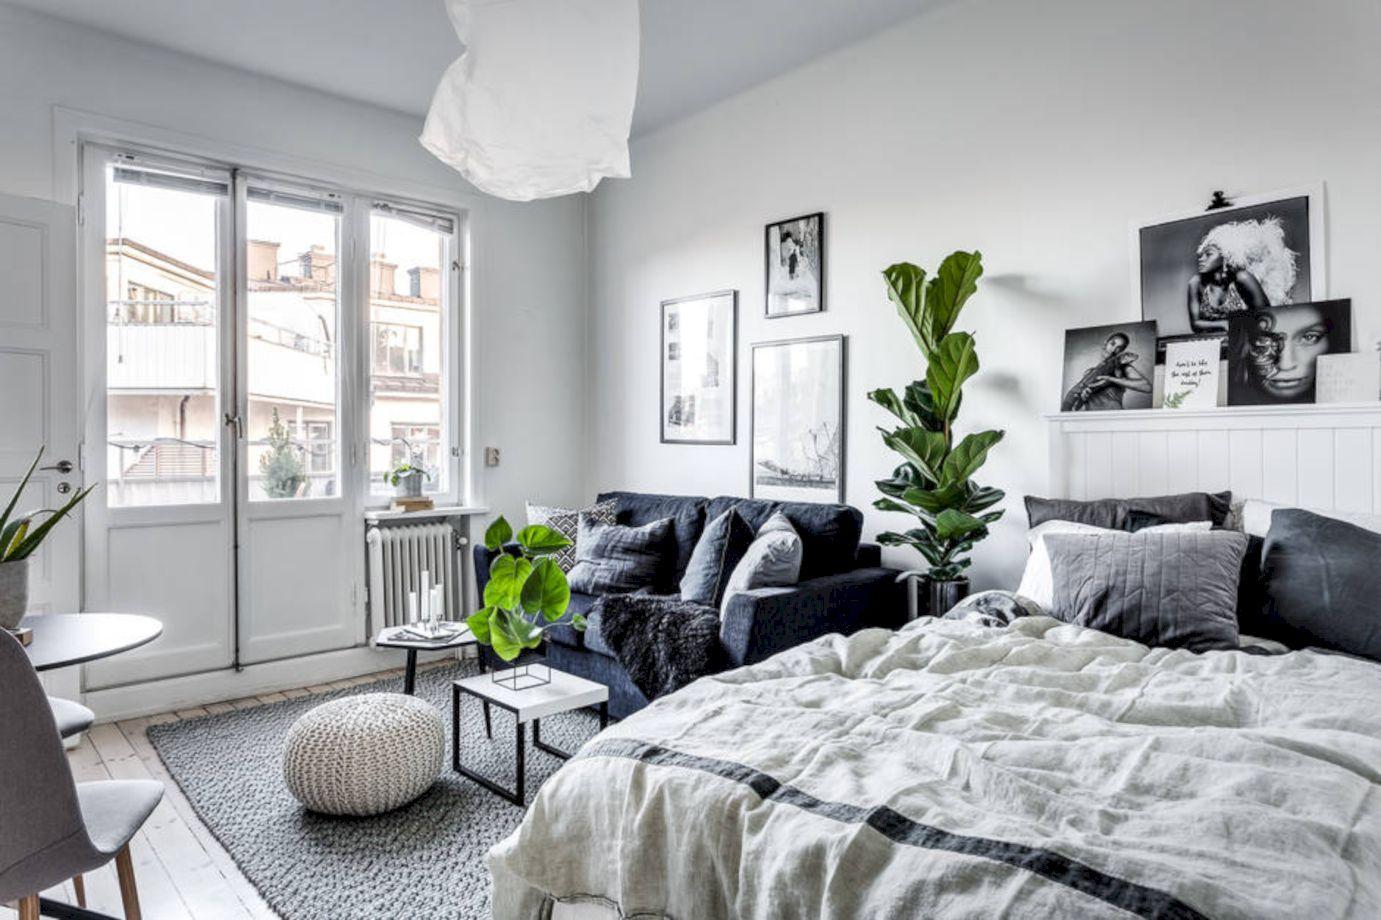 50 Cozy Minimalist Studio Apartment Decor Ideas Roundecor Apartment Bedroom Decor Small Apartment Decorating Apartment Room Cosy studio bedroom designs